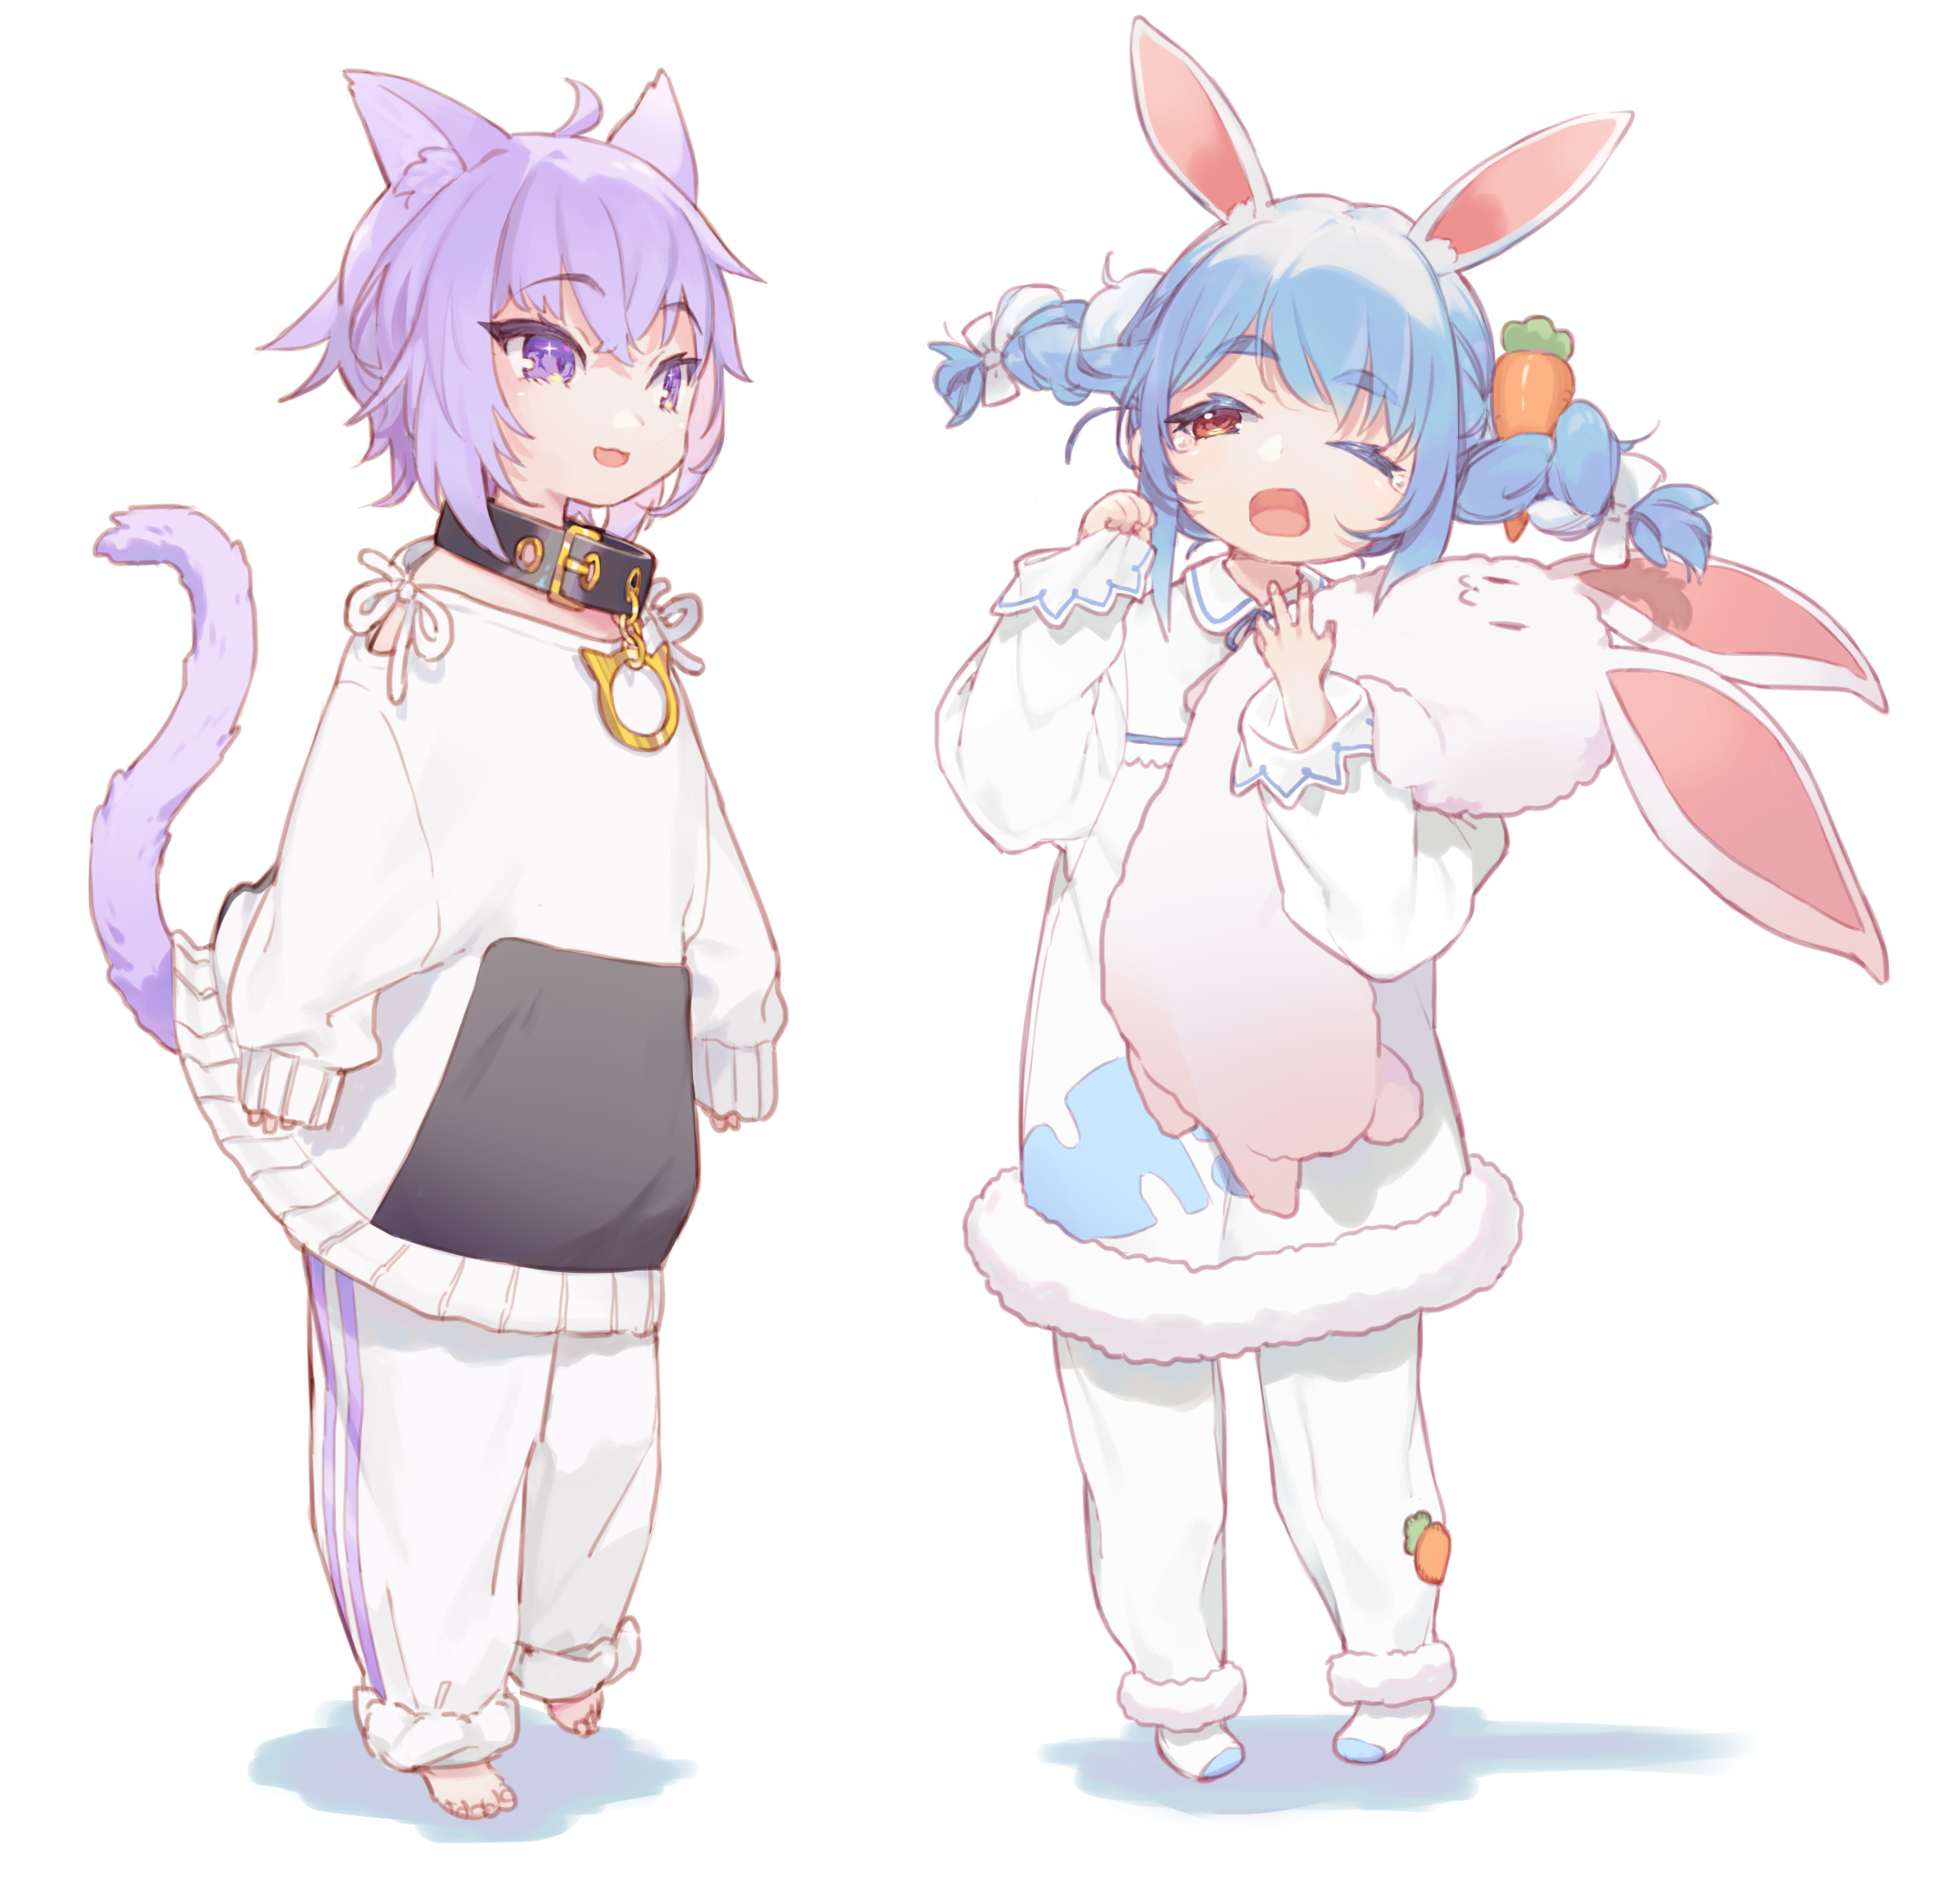 Little Okayu and Pekora [Hololive]